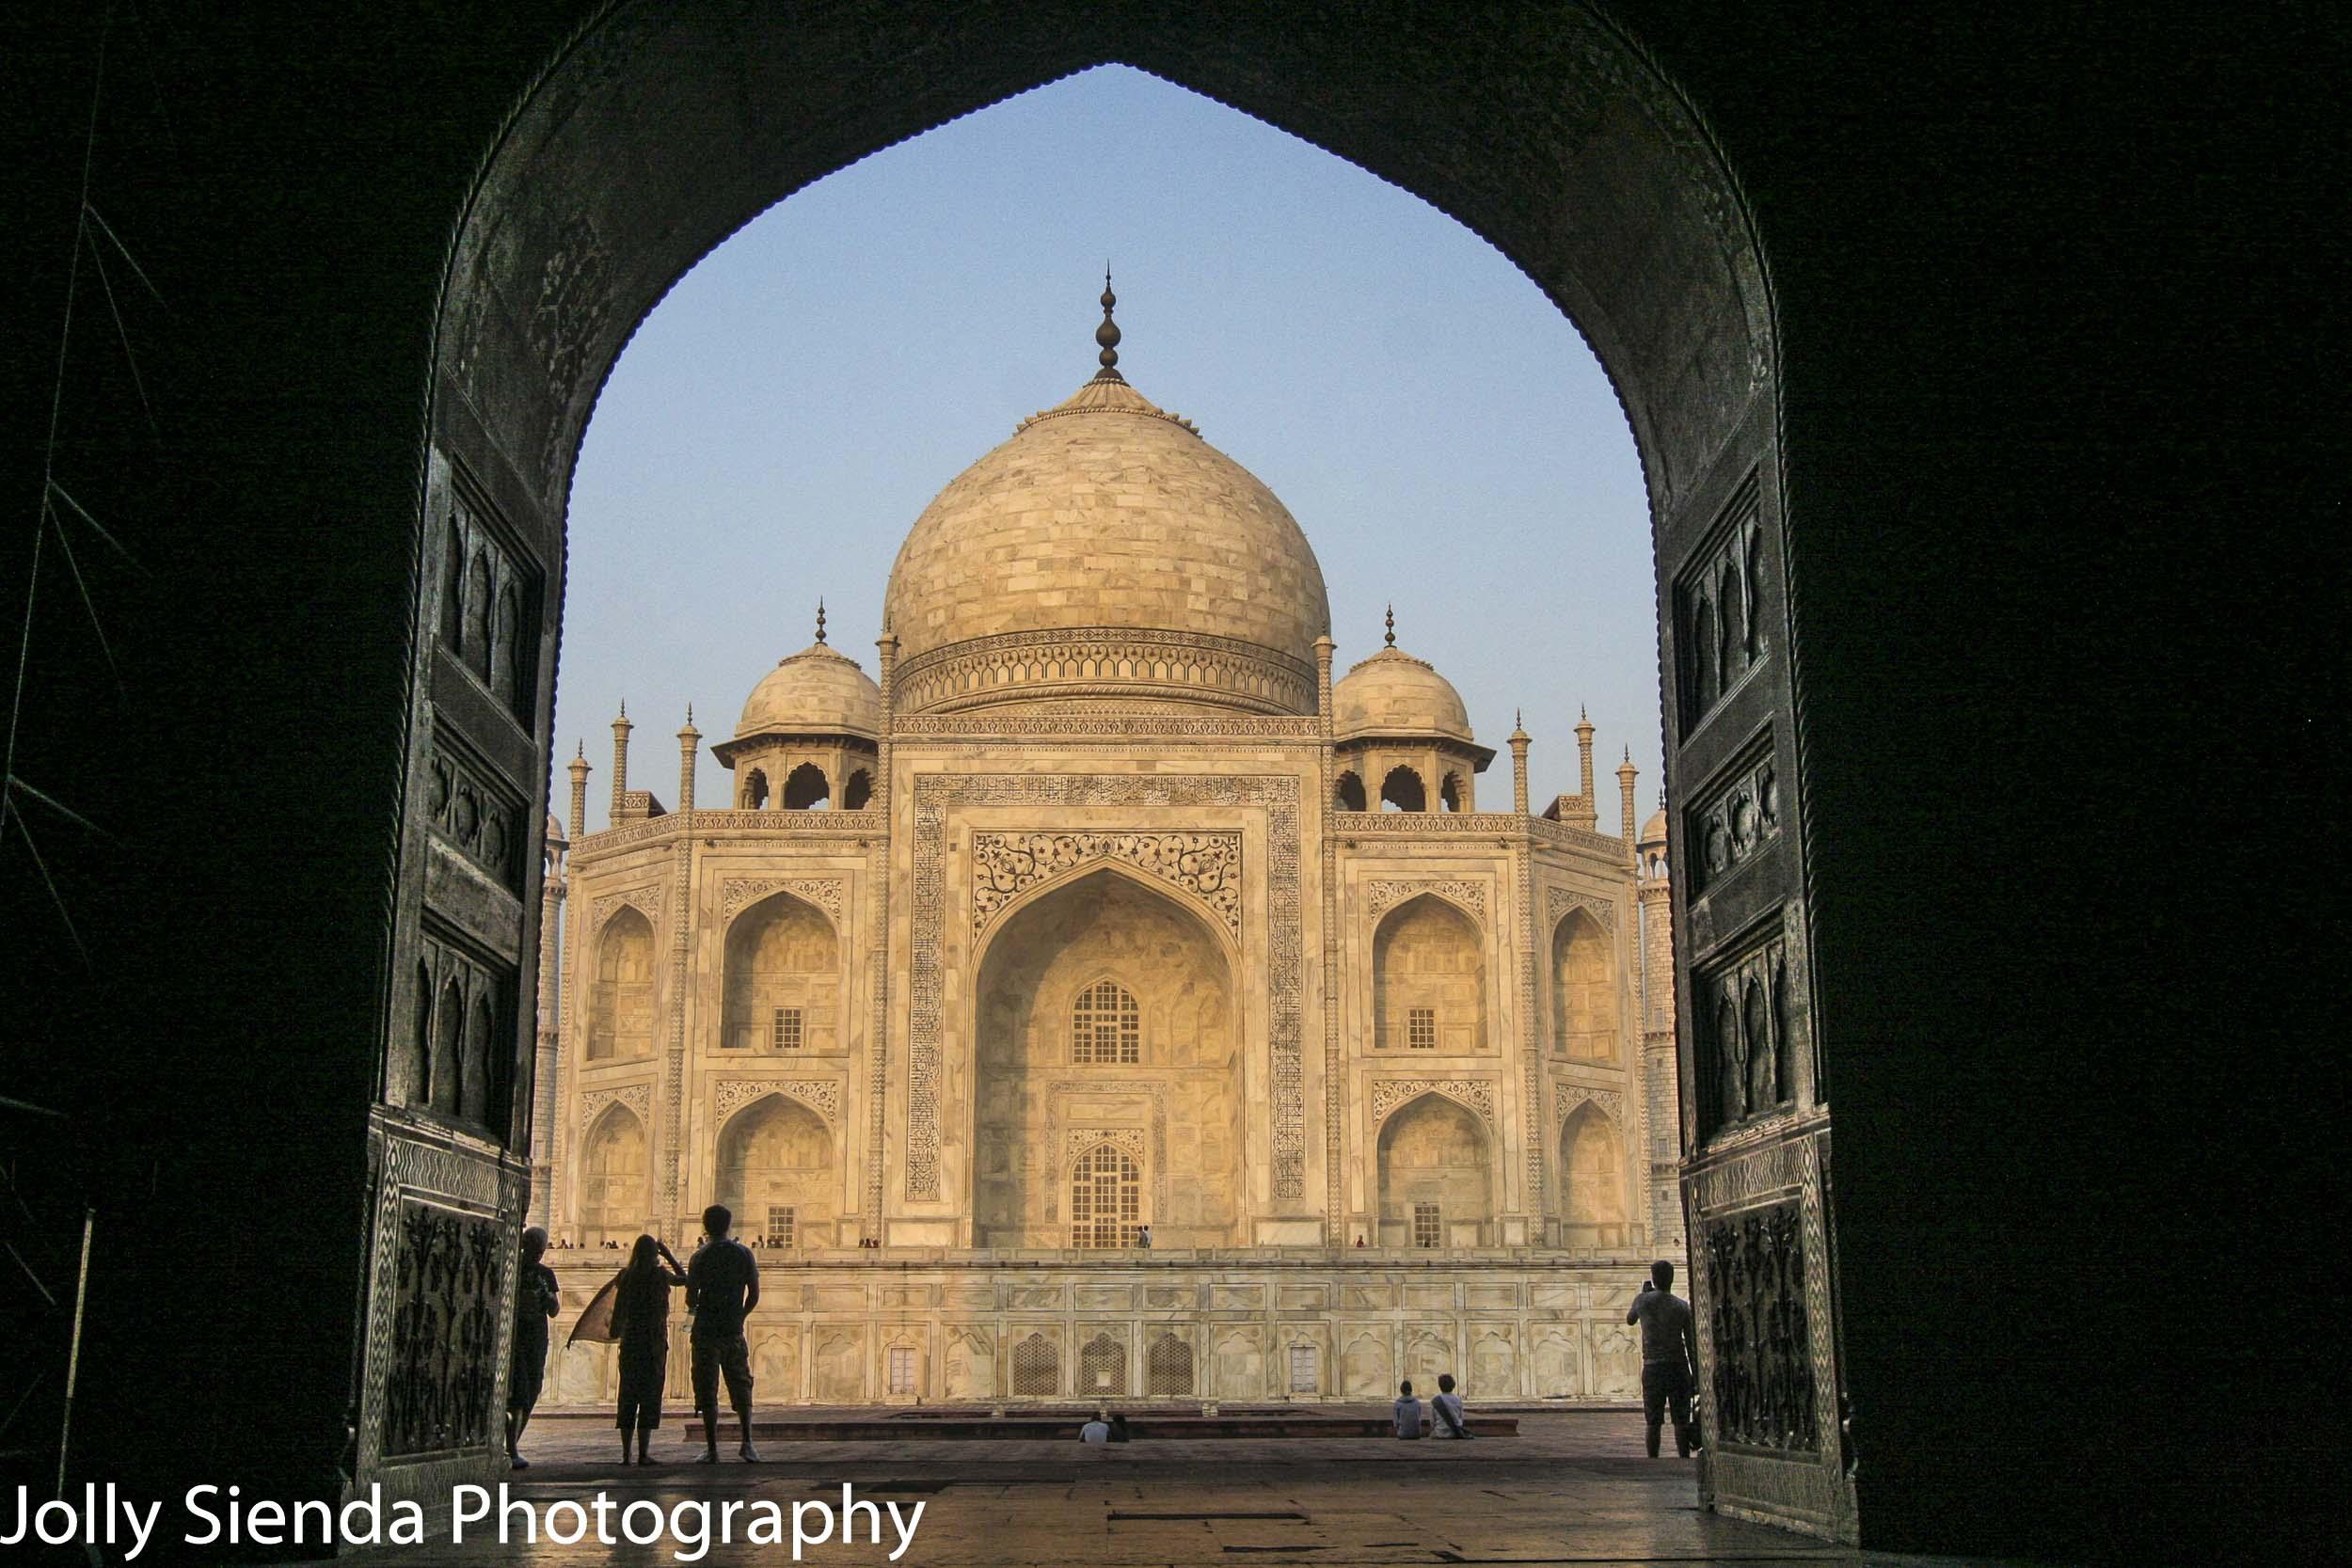 Large doorway leads to the Taj Mahal